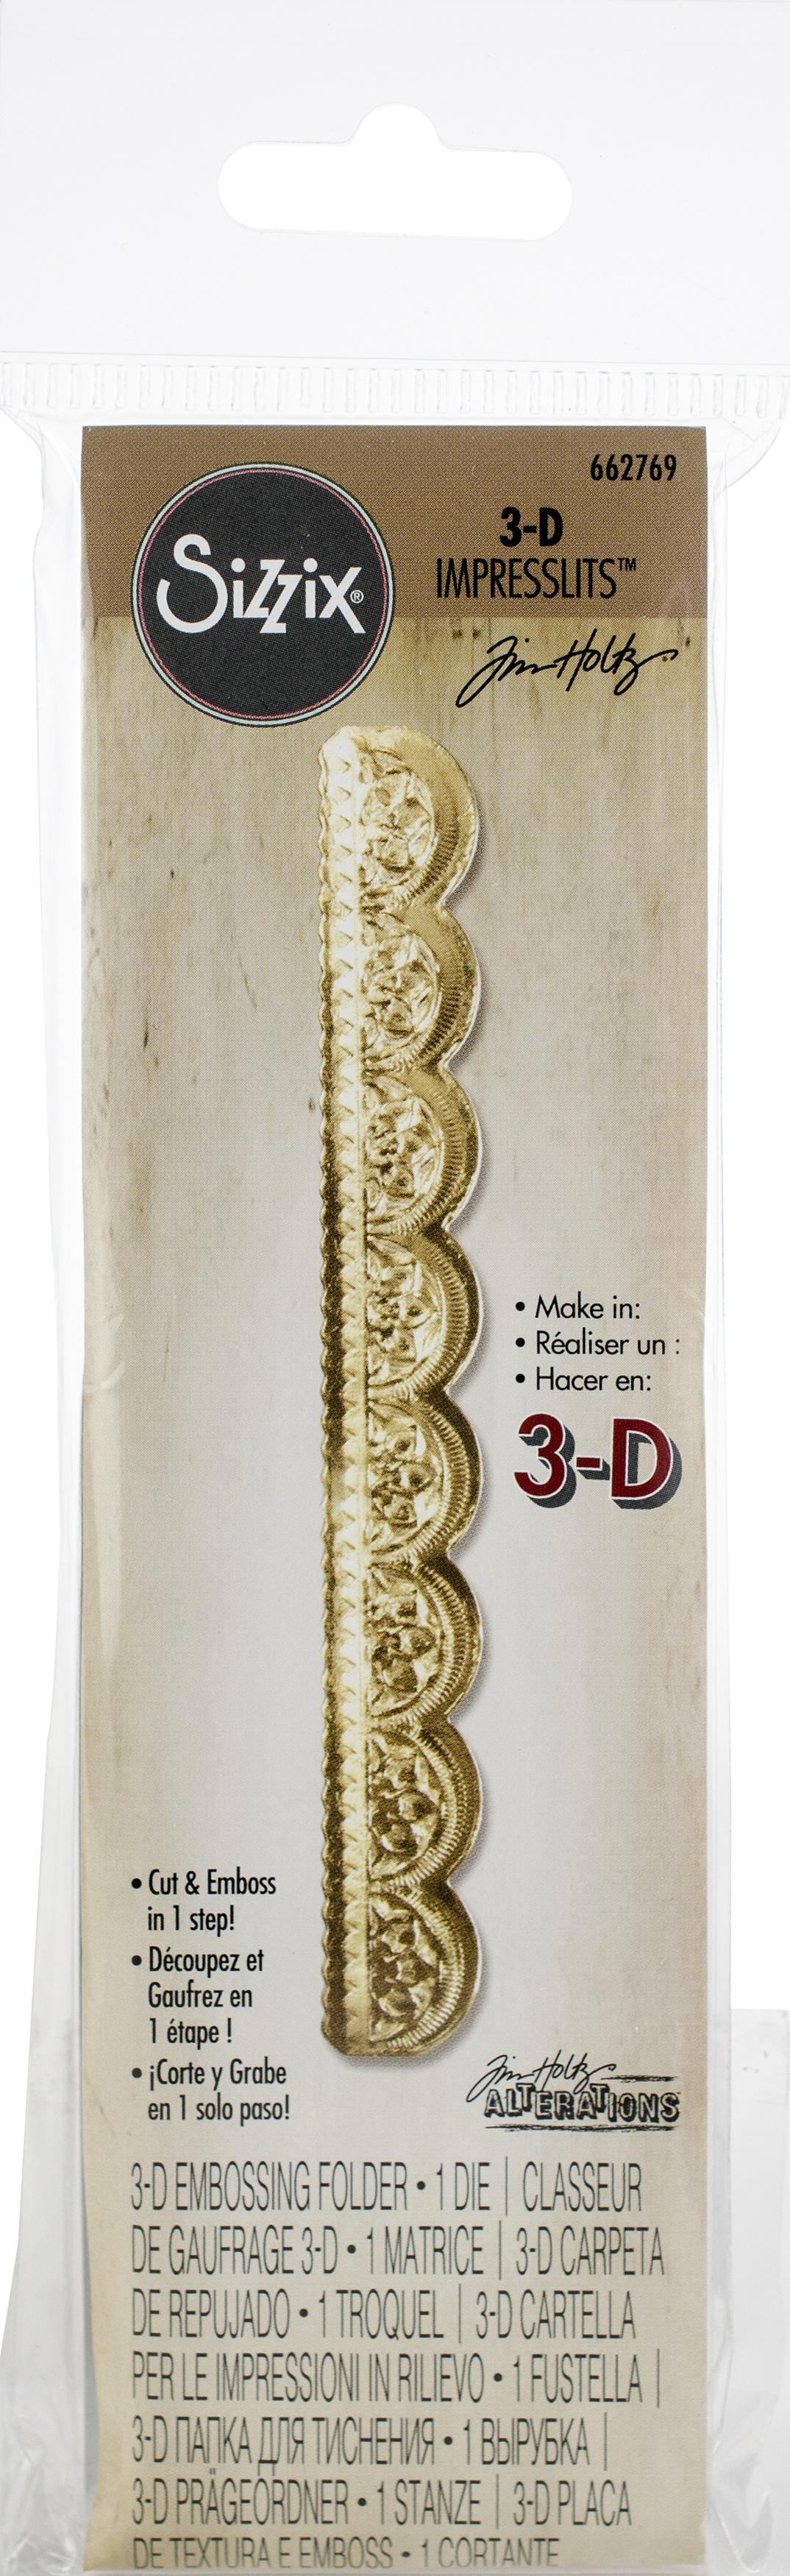 Sizzix 3D Impresslits Embossing Folder By Tim Holtz-Mini Scallop